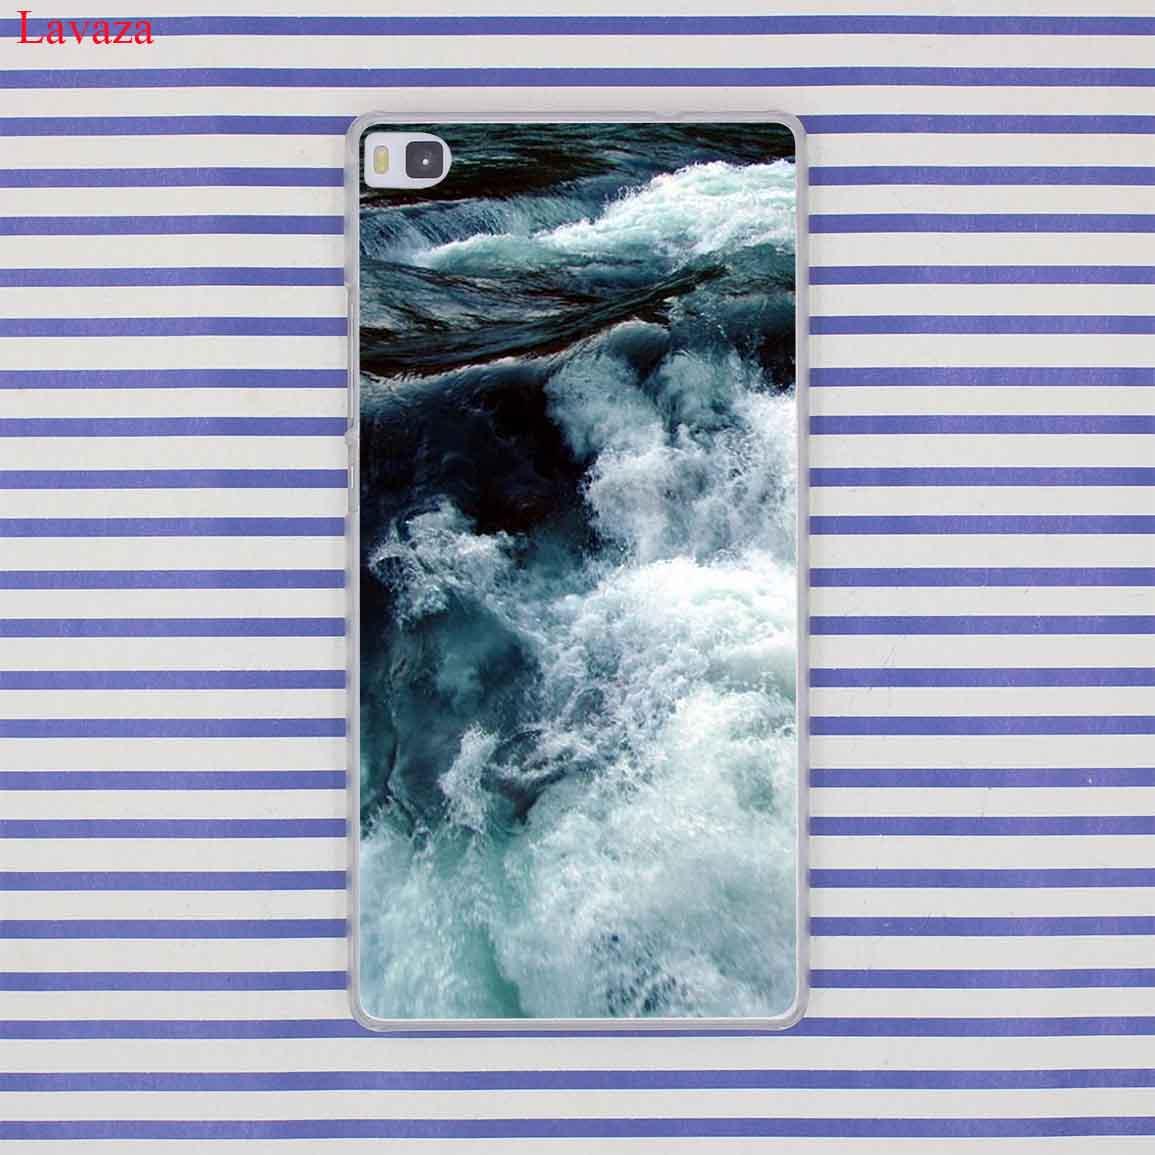 Lavaza волны океана воды света преломлений чехол для huawei P20 P10 P9 плюс P8 Lite Mini 2016 2017 P Smart коврики 10 9 Lite Pro